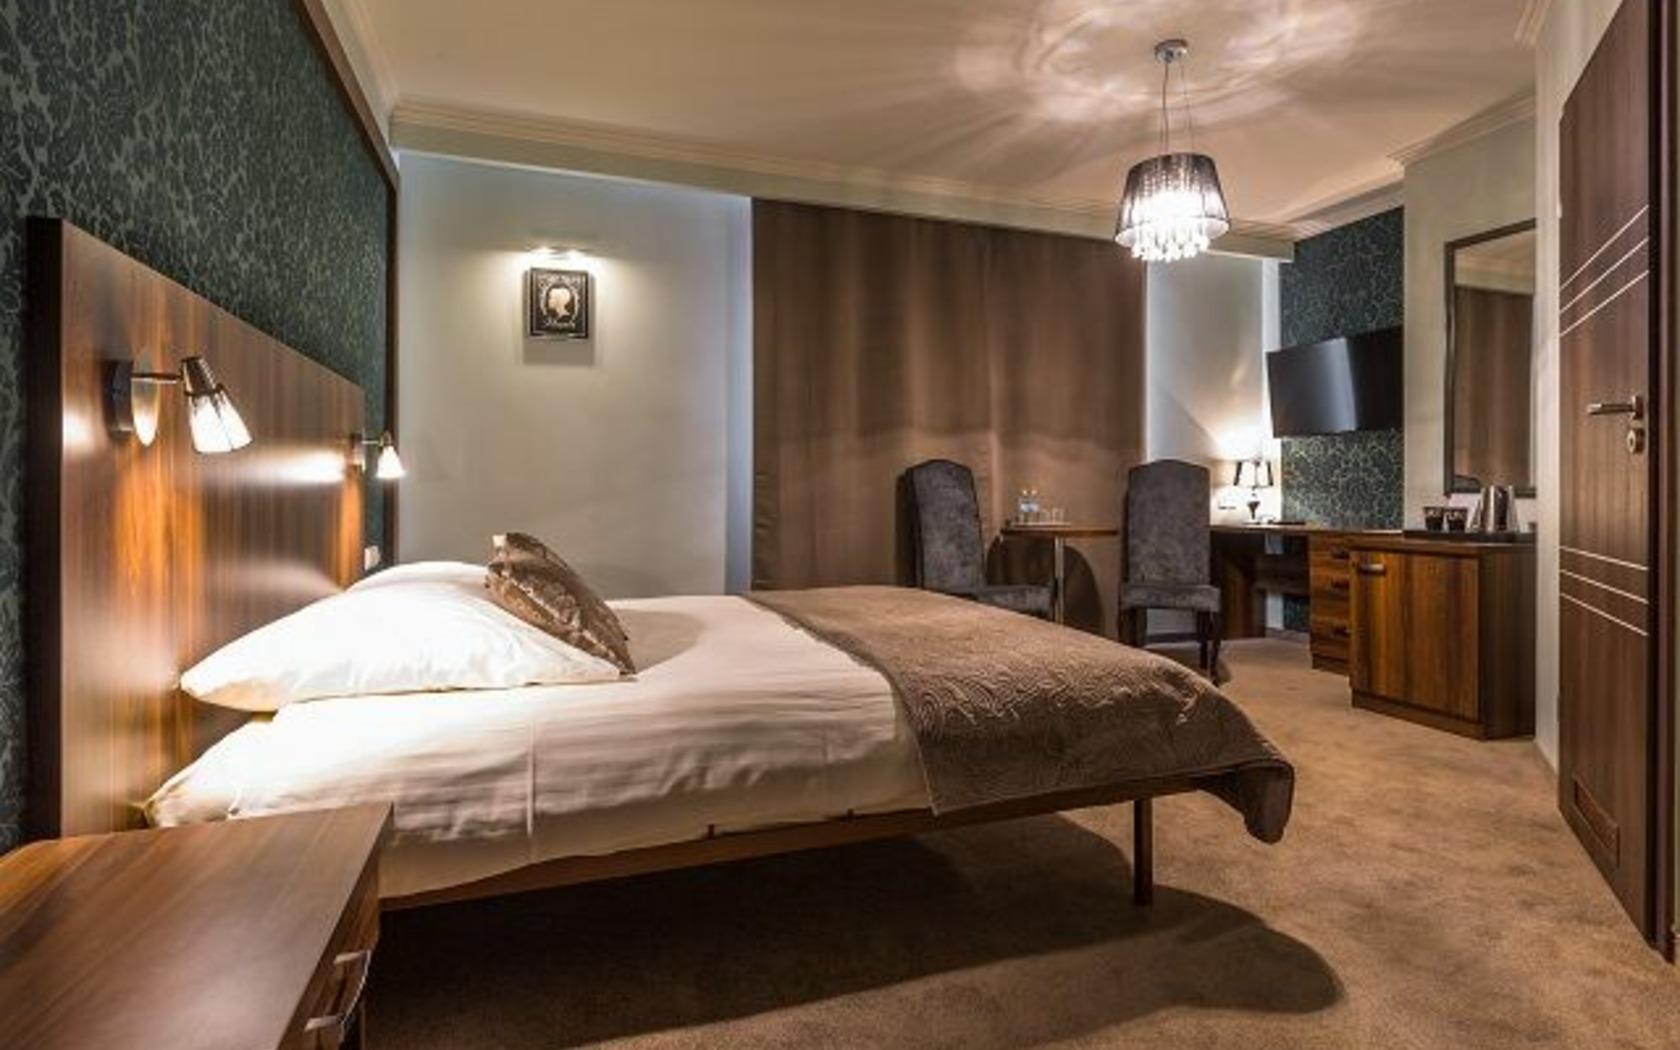 Doppelzimmer im Hotel, Foto: Marketing und Tourismus Guben e.V.